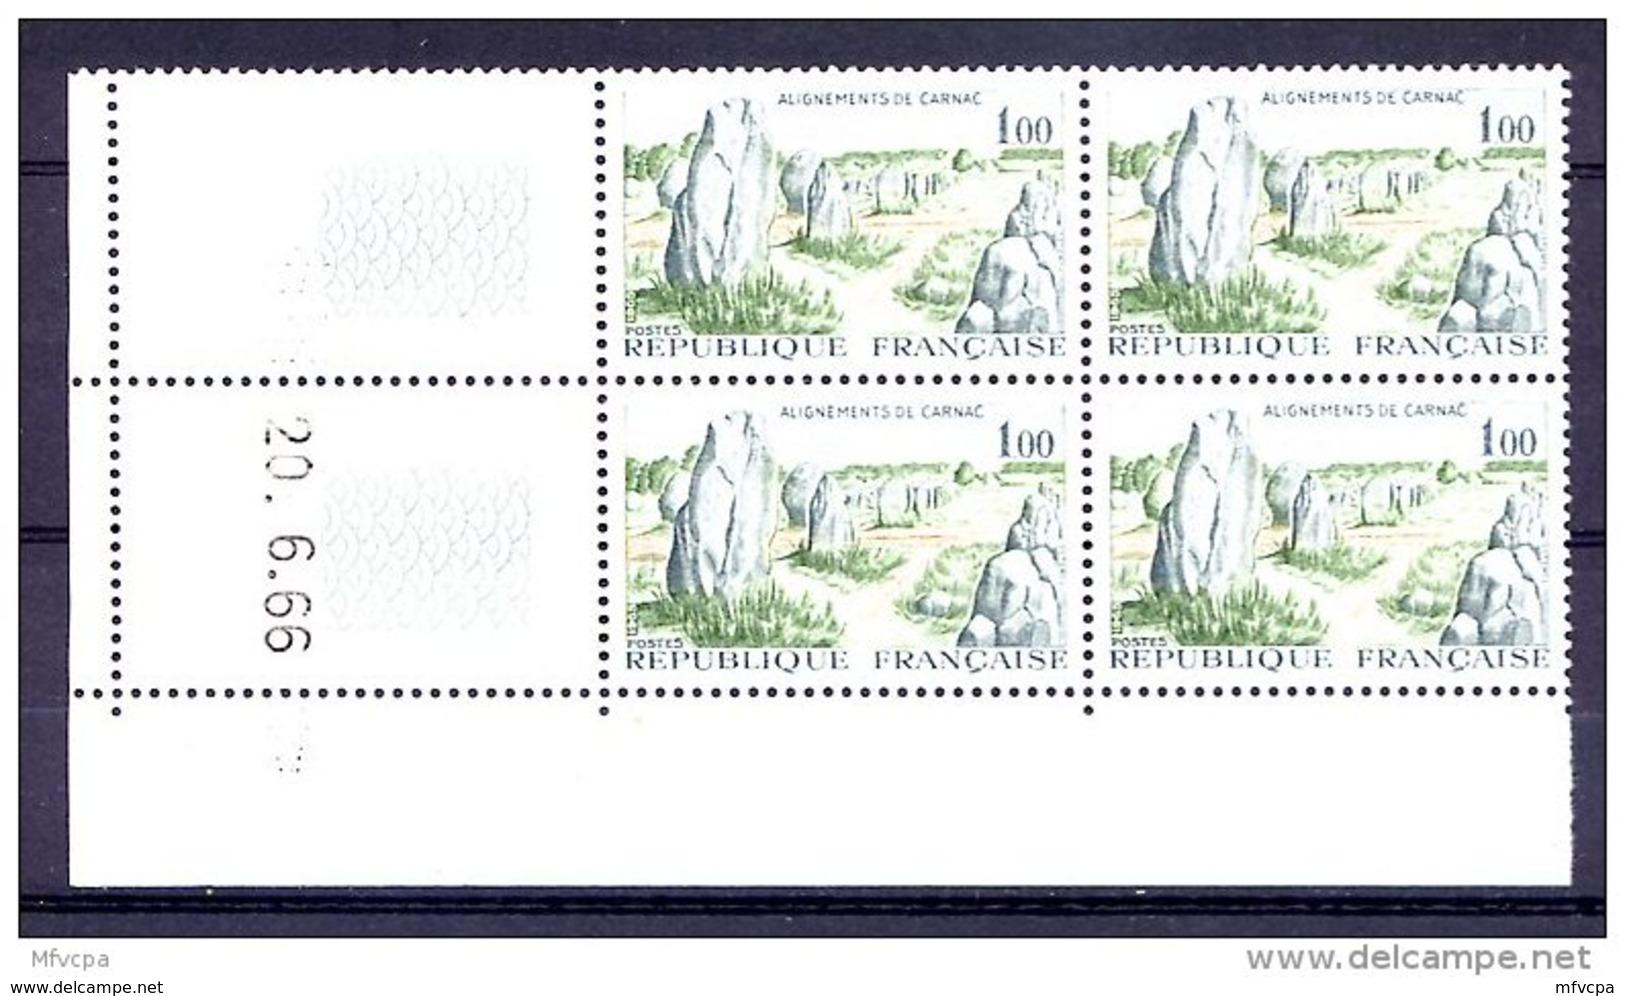 Cd5023 YvT 1440 Carnac 1.00 Coin Daté 20/06/66 6ème Tirage N** - 1960-1969